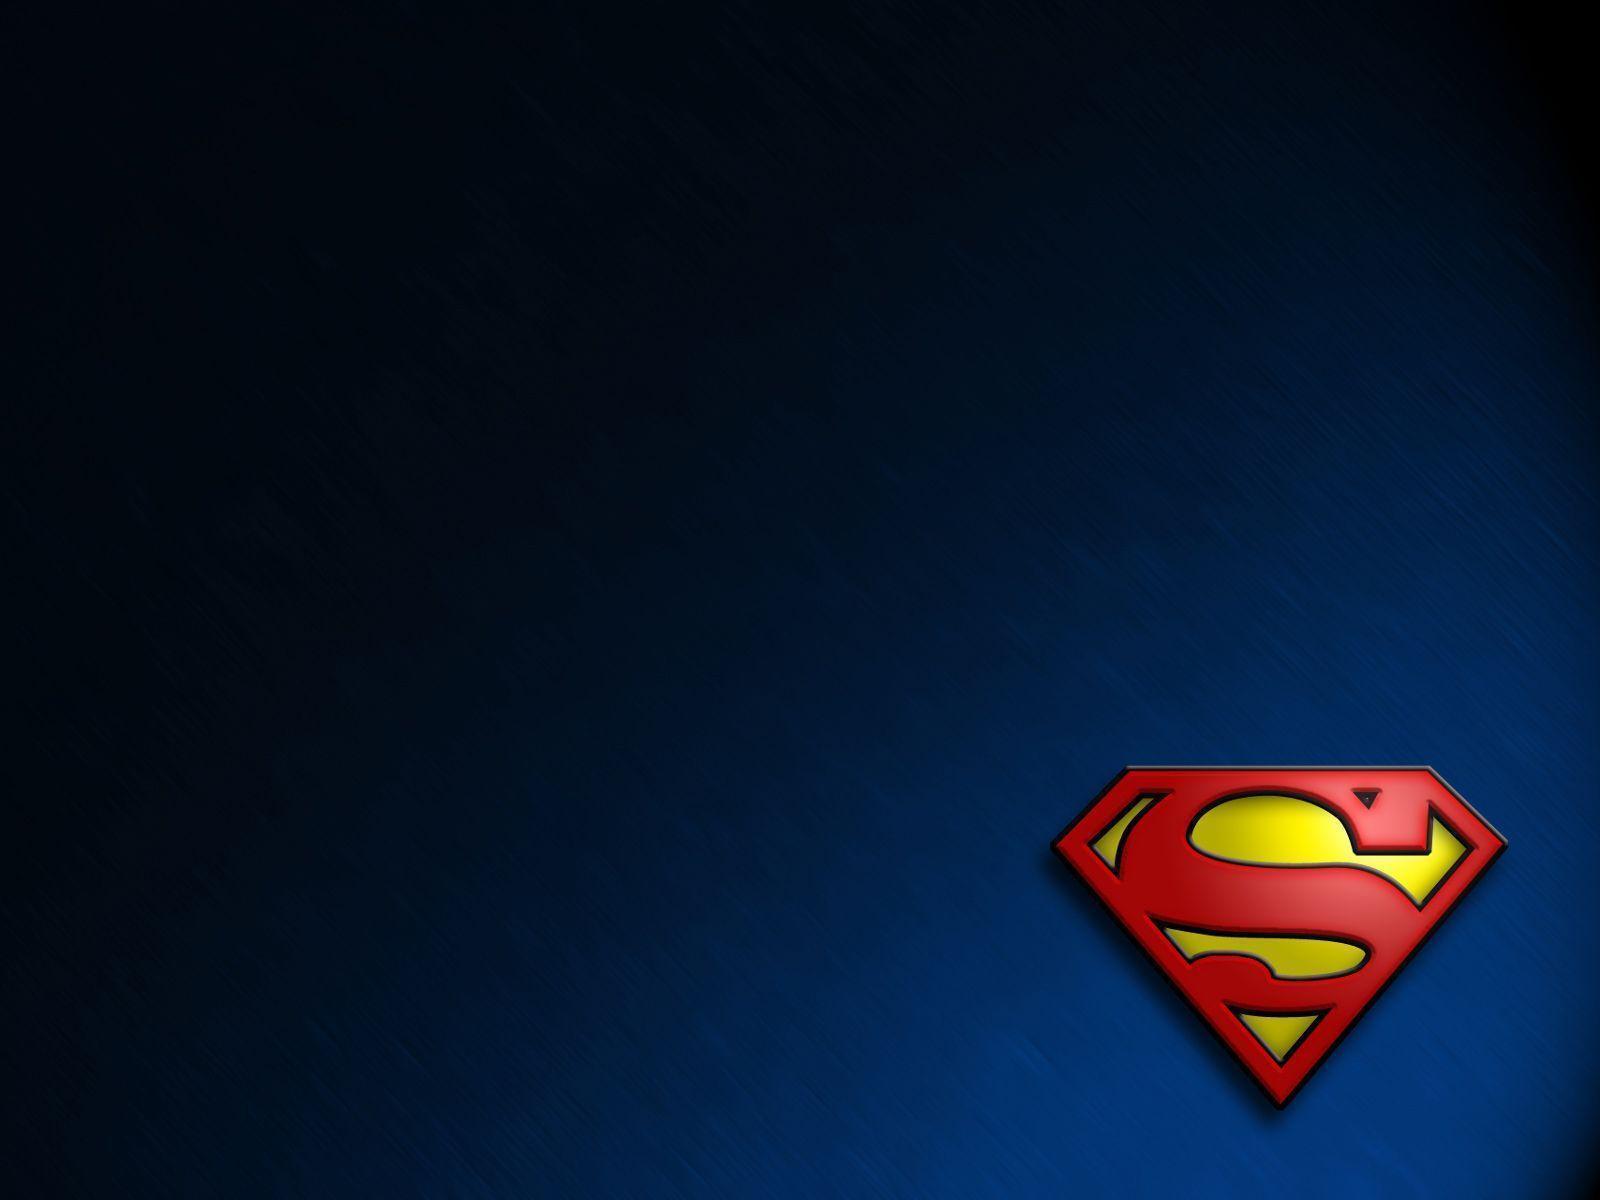 Superman Logo Wallpapers 1600x1200